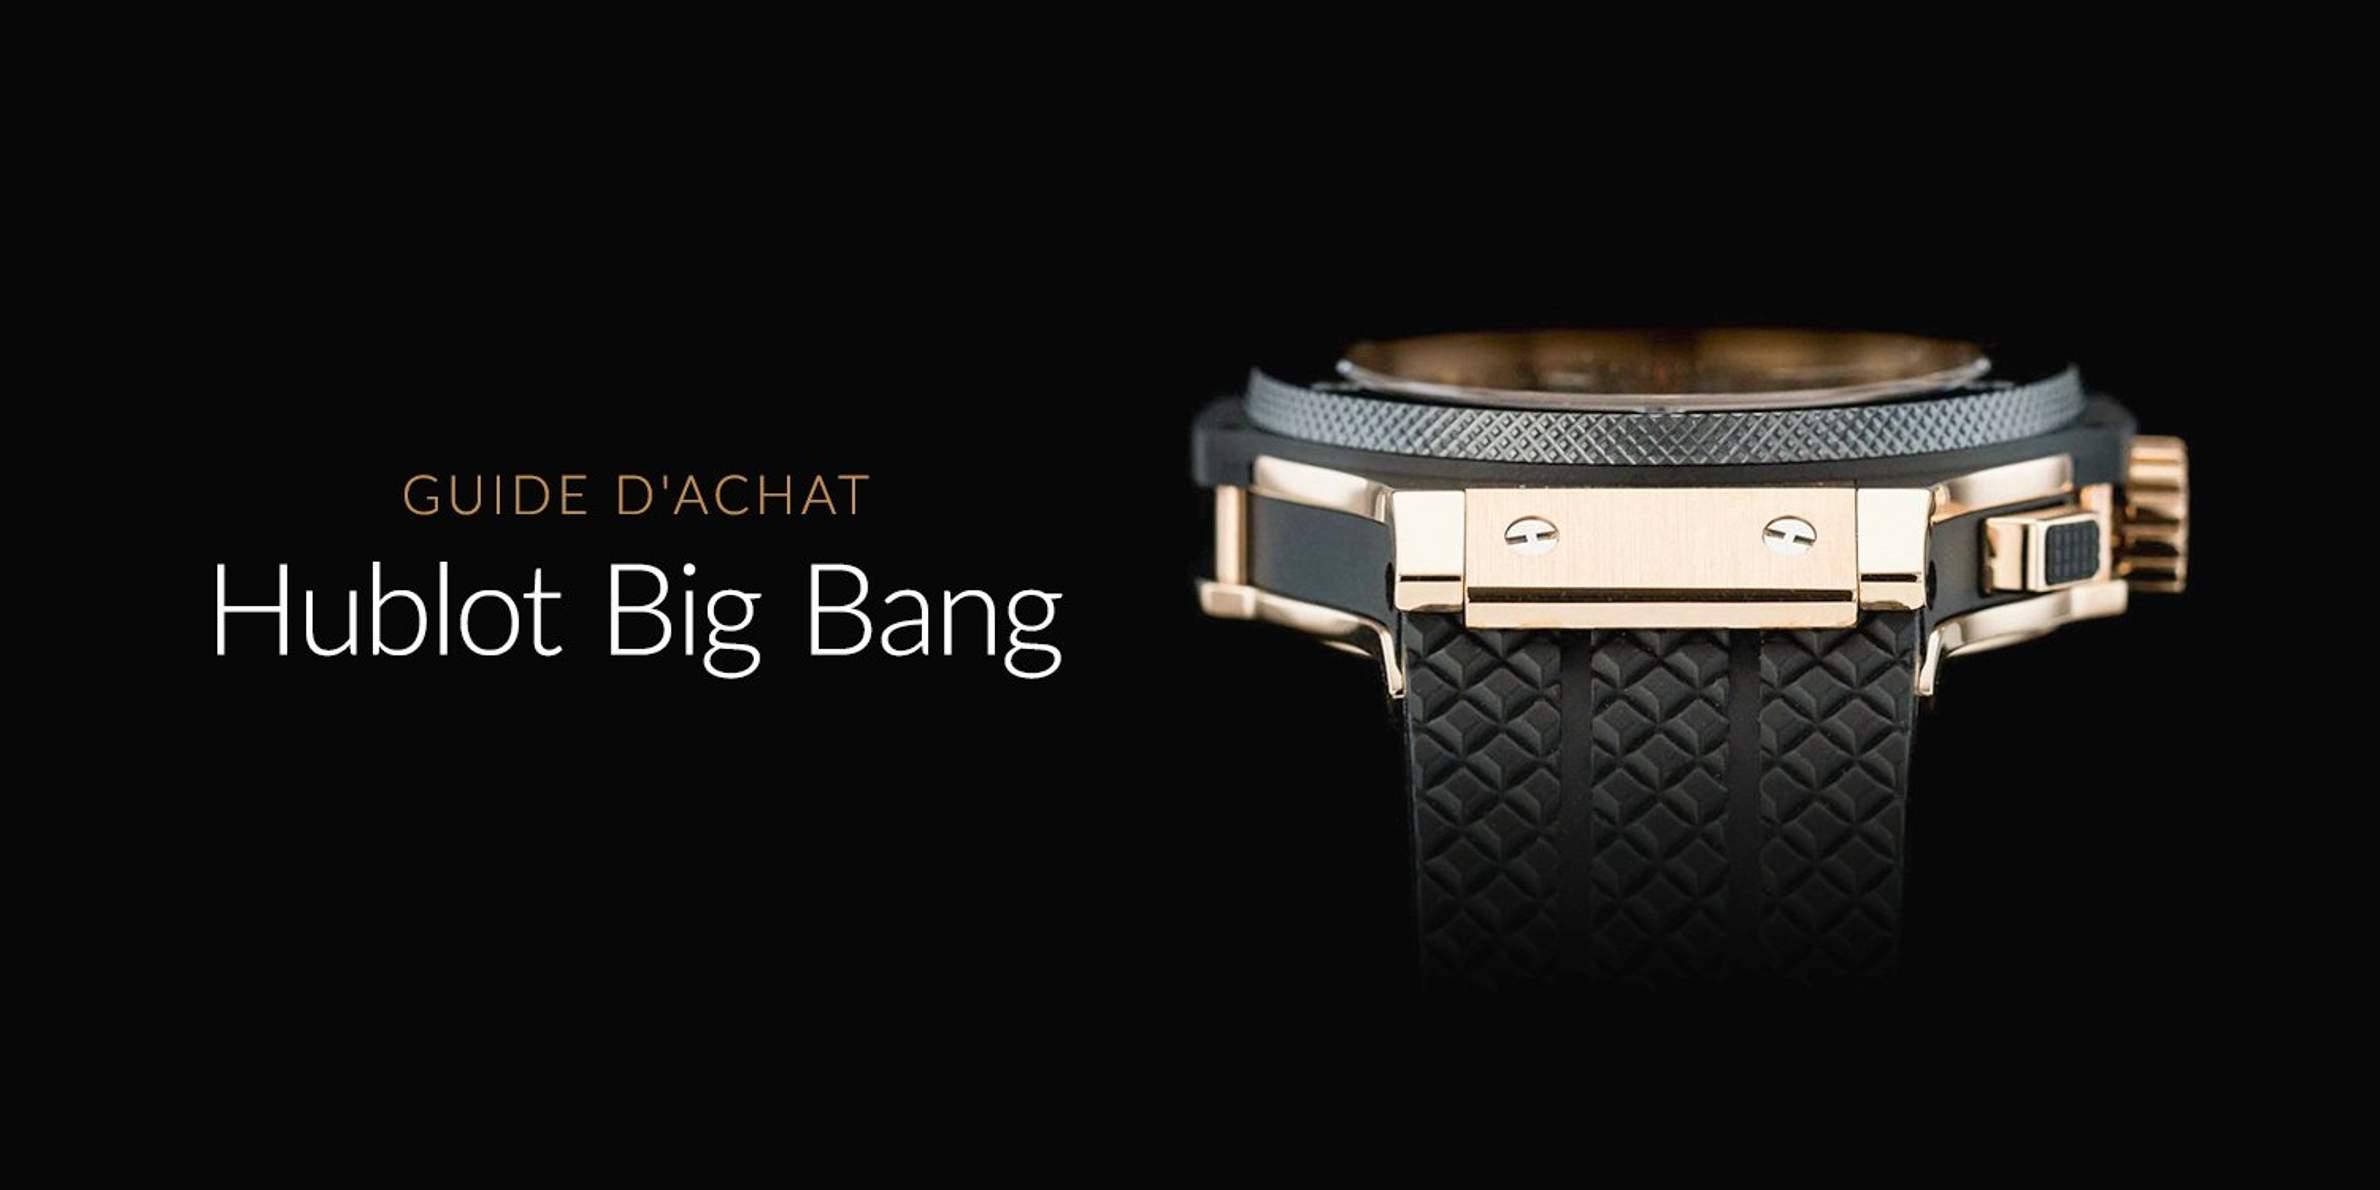 CAM-1709-Buyers-Guide-Hublot-Big-Bang-2-1-FR